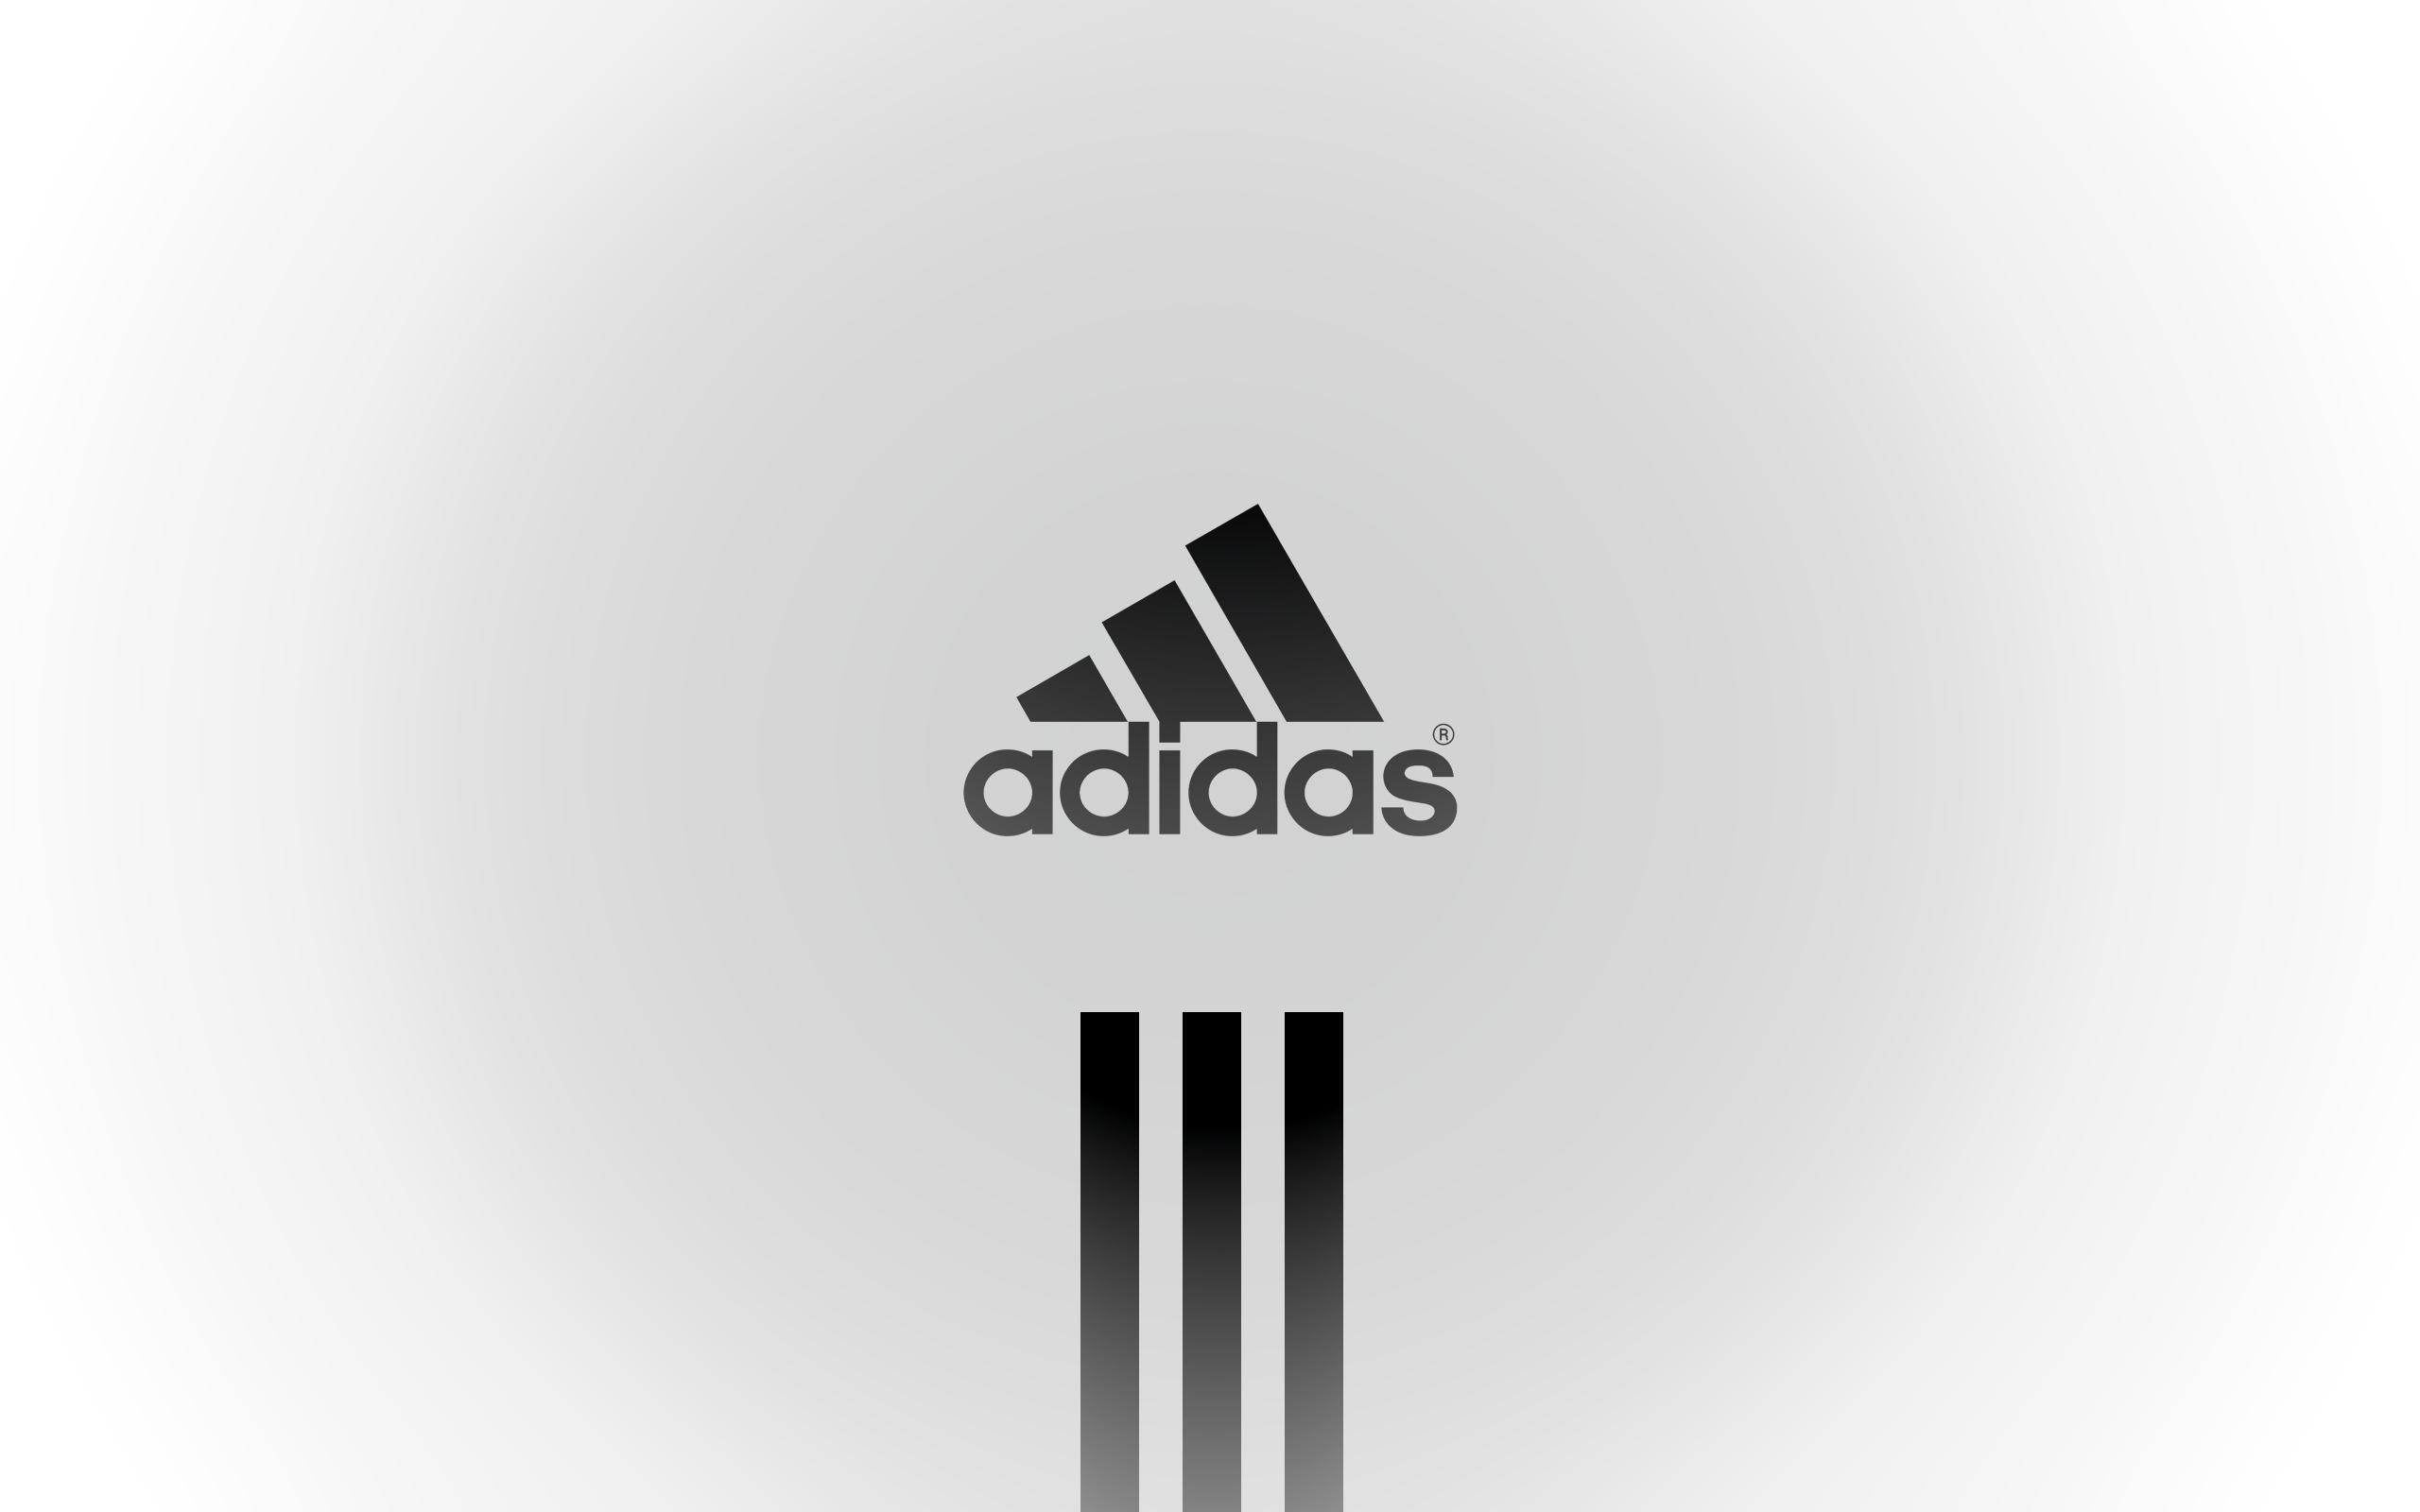 Adidas Wallpaper K Ultra HD Adidas Wallpapers Backgrounds LL